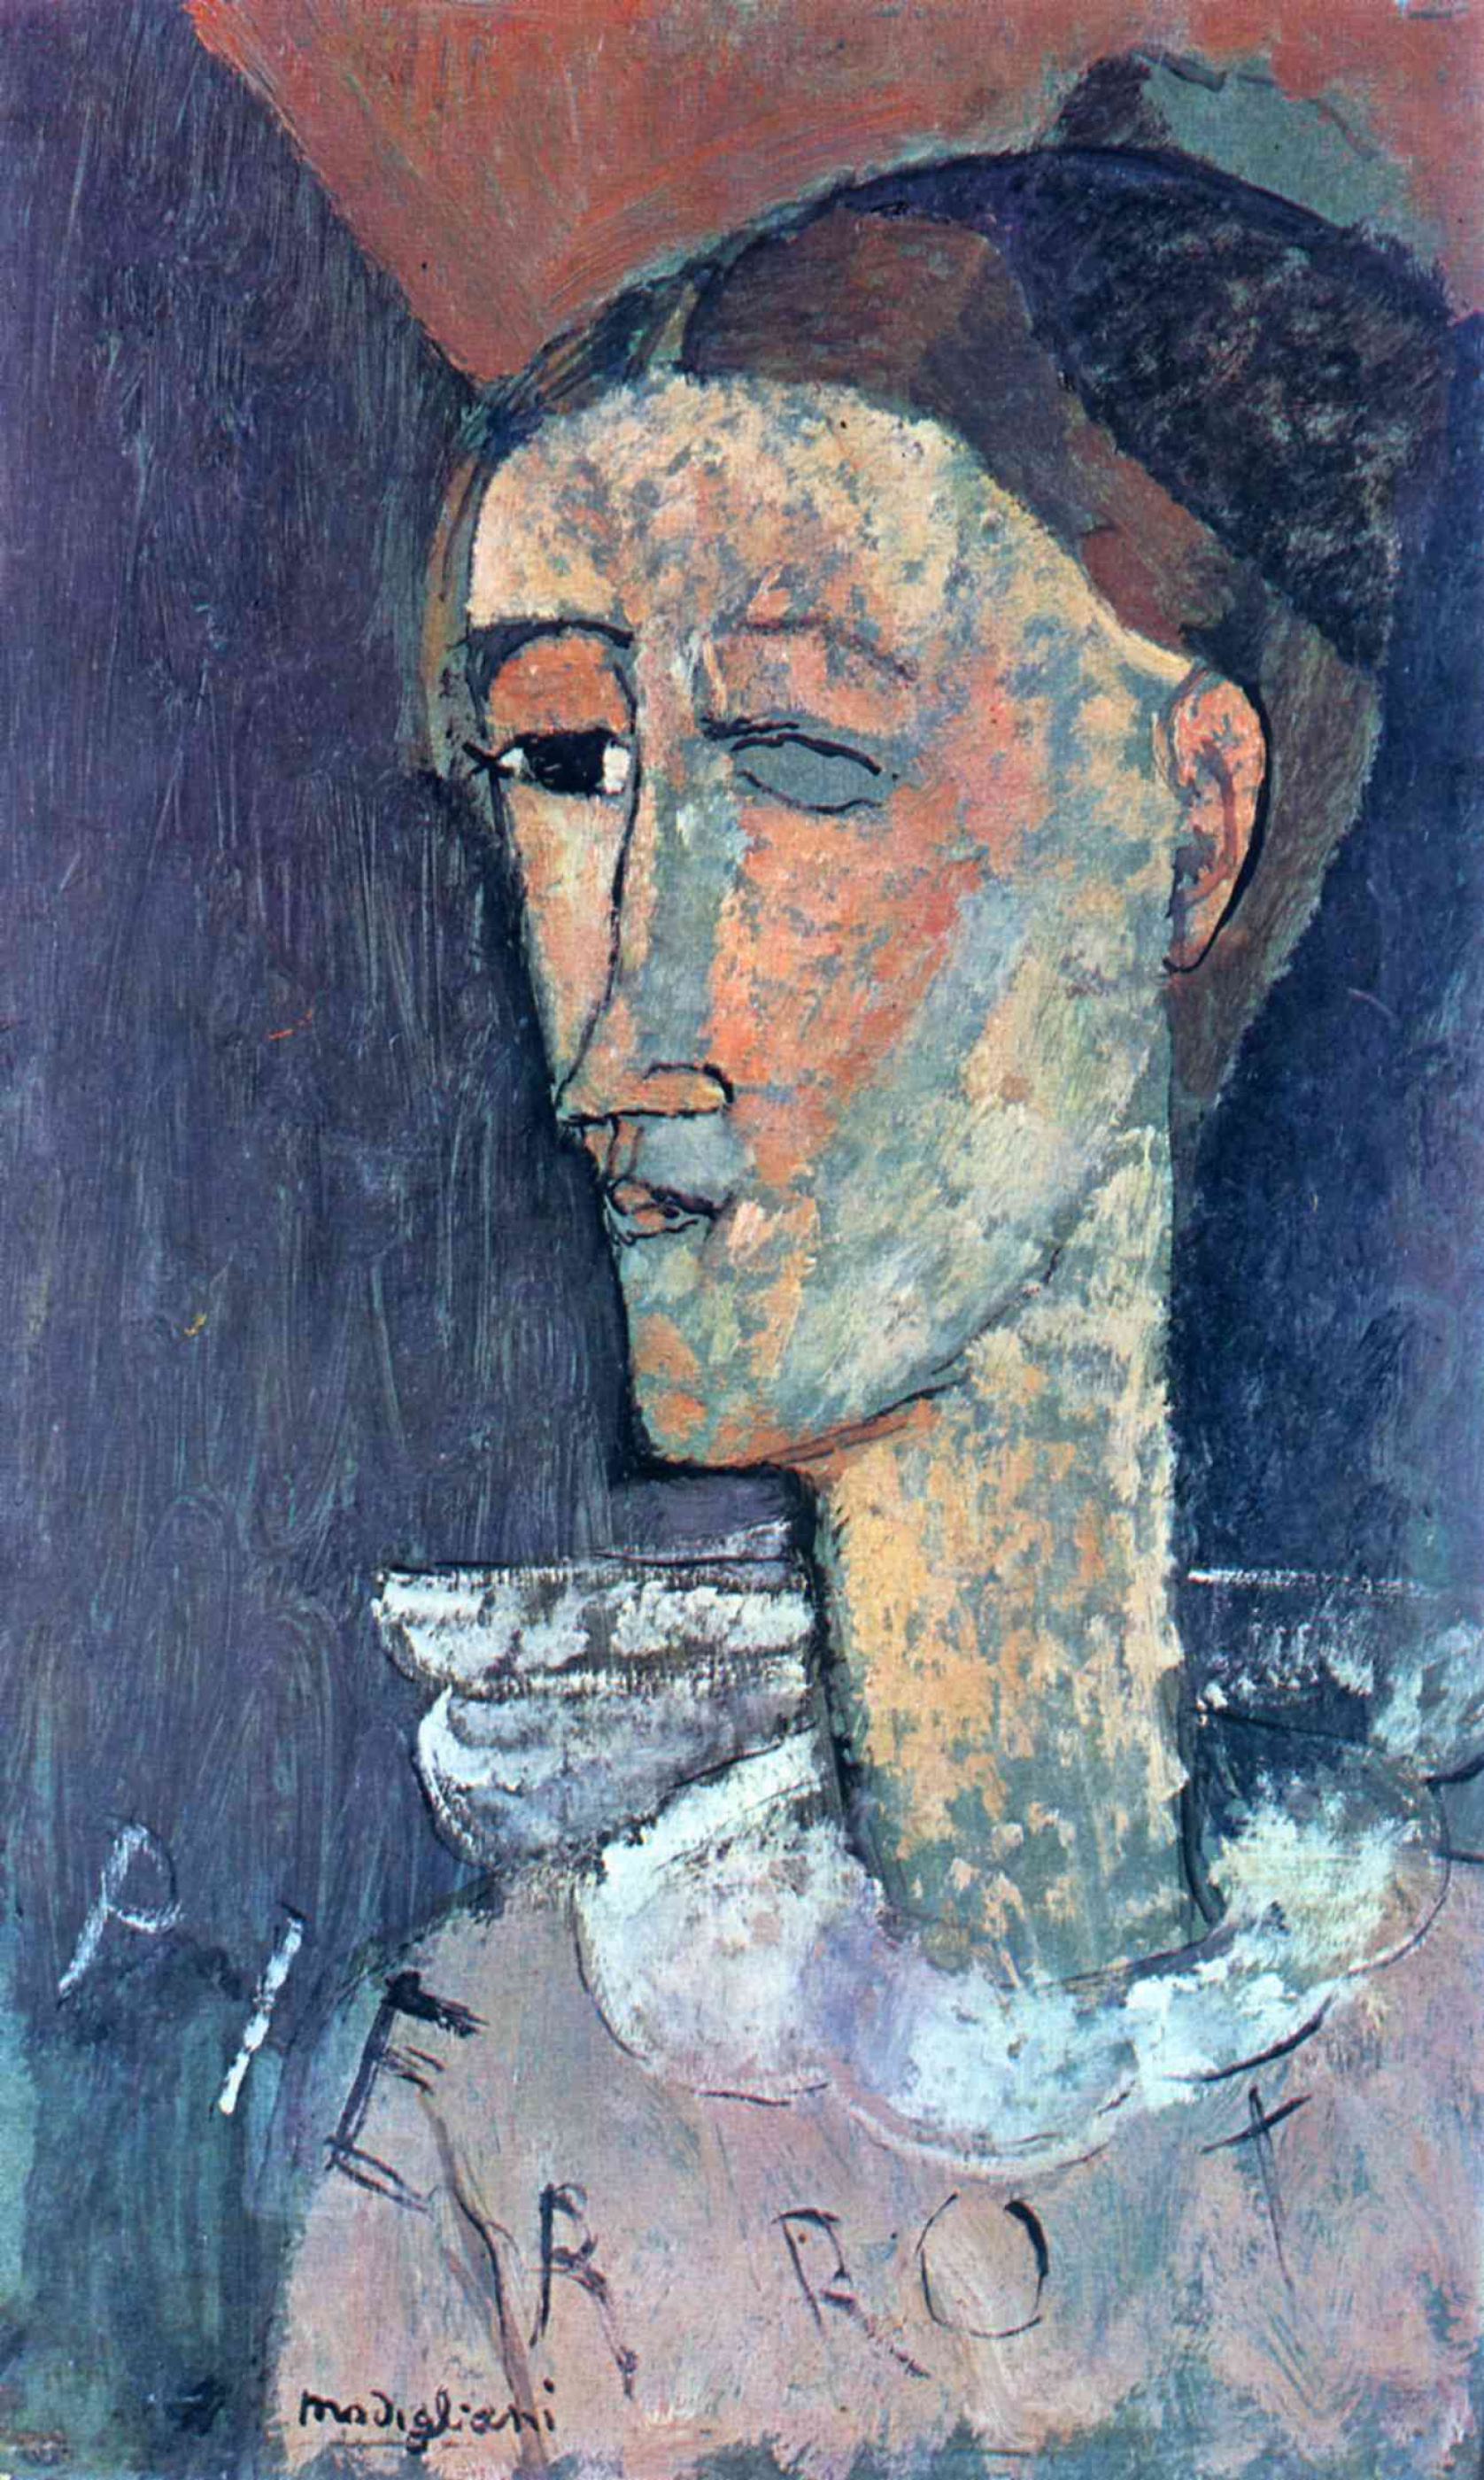 Amedeo Modigliani. Self-portrait in a Pierrot